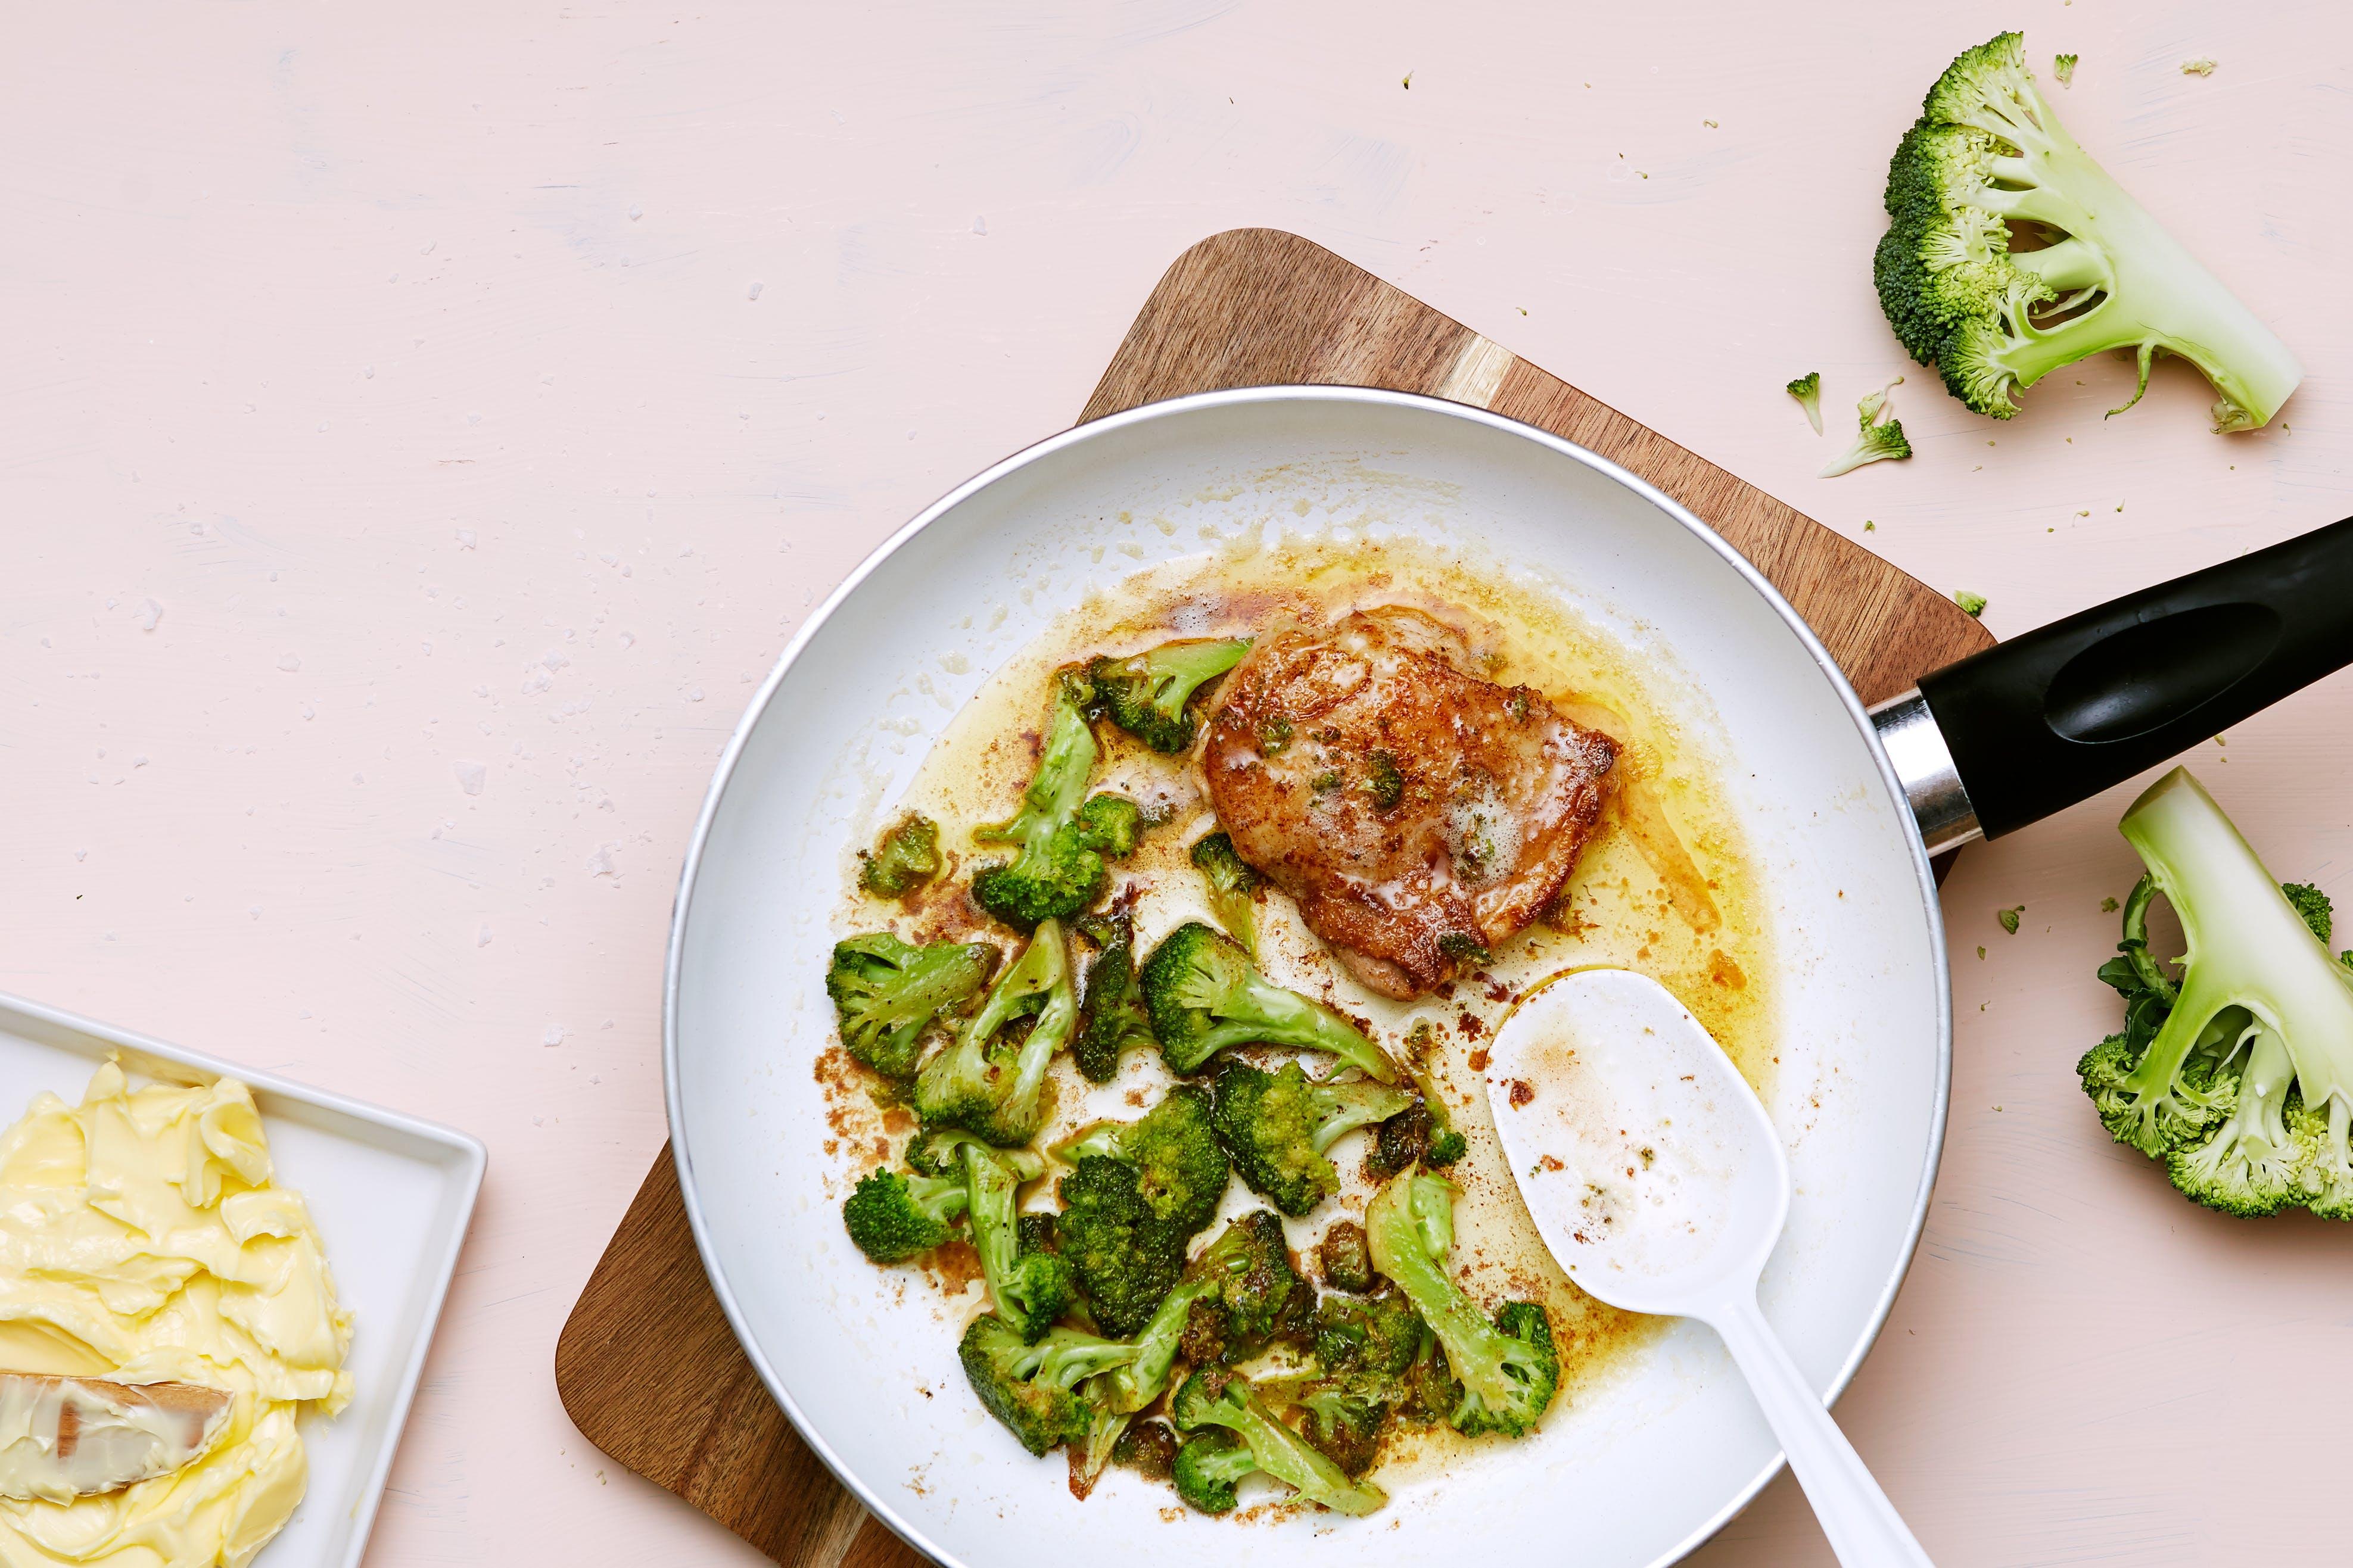 Keto fried chicken with broccoli